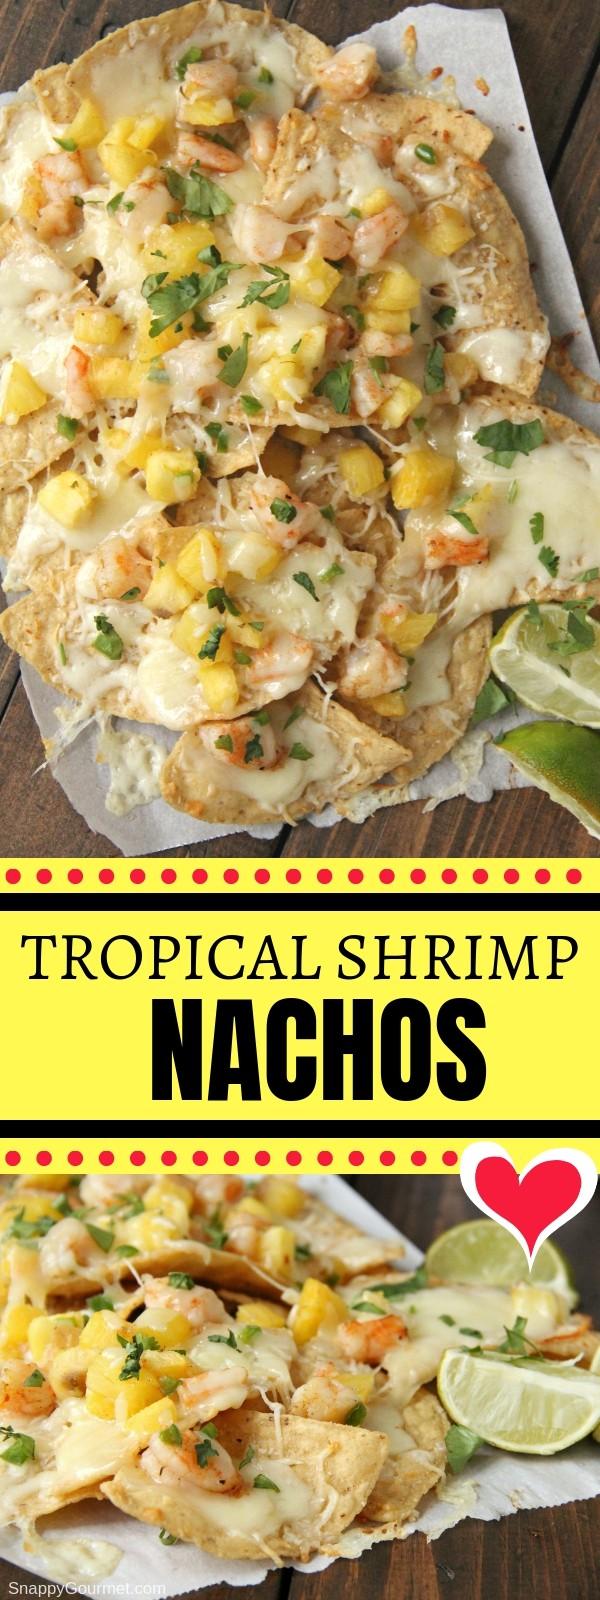 shrimp nacho collage